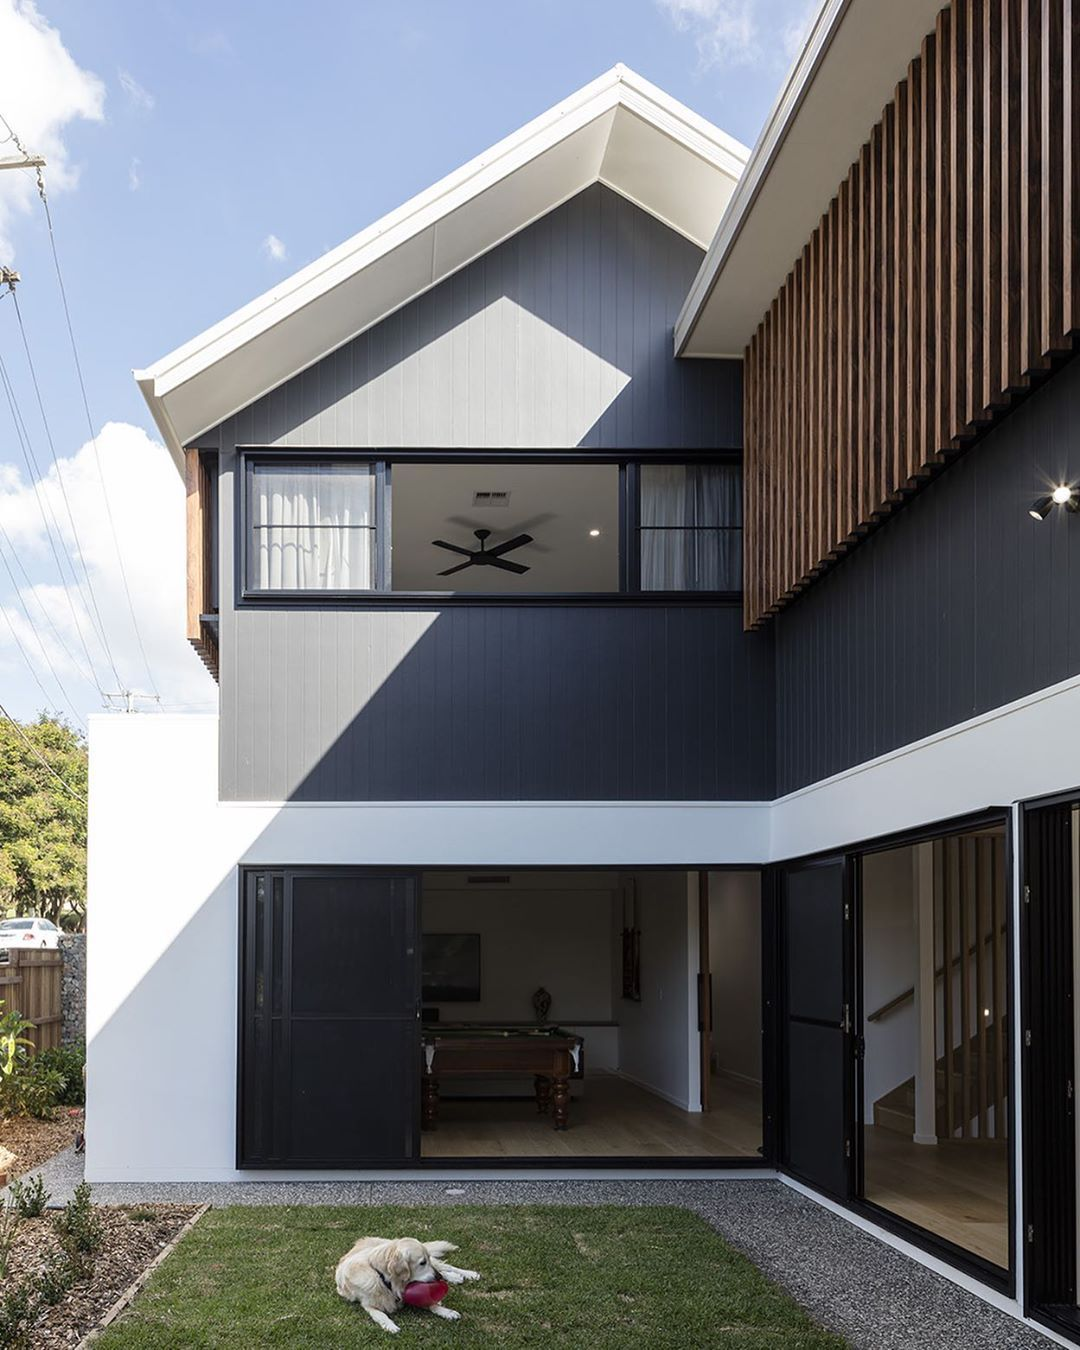 Home Design Ideas Australia: Wood Look Aluminium Systems. No Maintenance & Australian